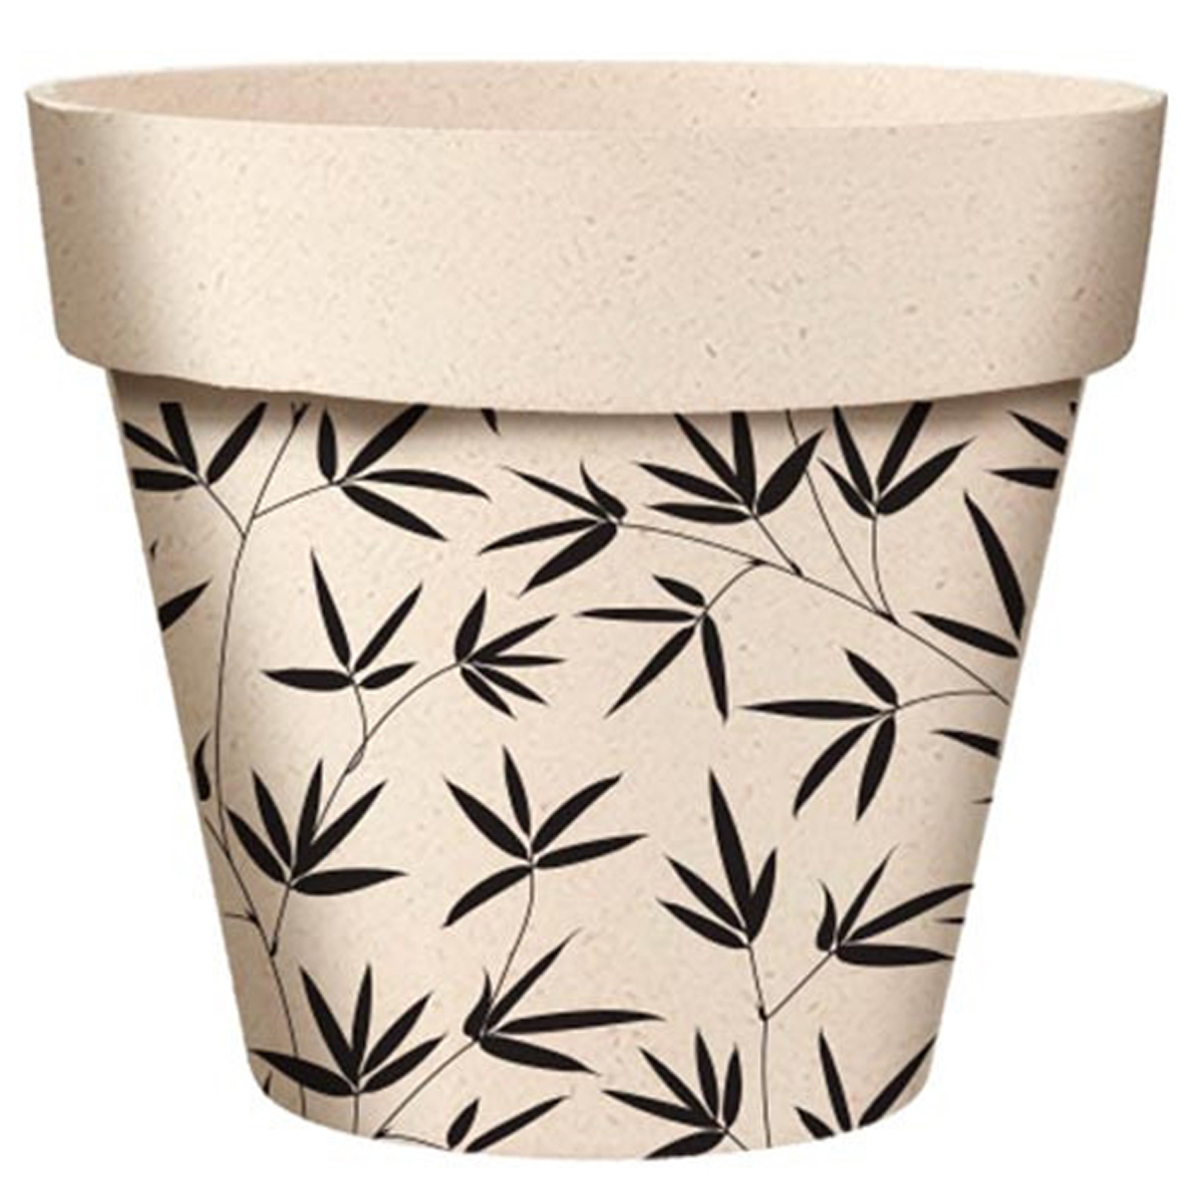 Cache-pot bambou \'Bambou\' noir beige - 17x15 cm - [A2055]